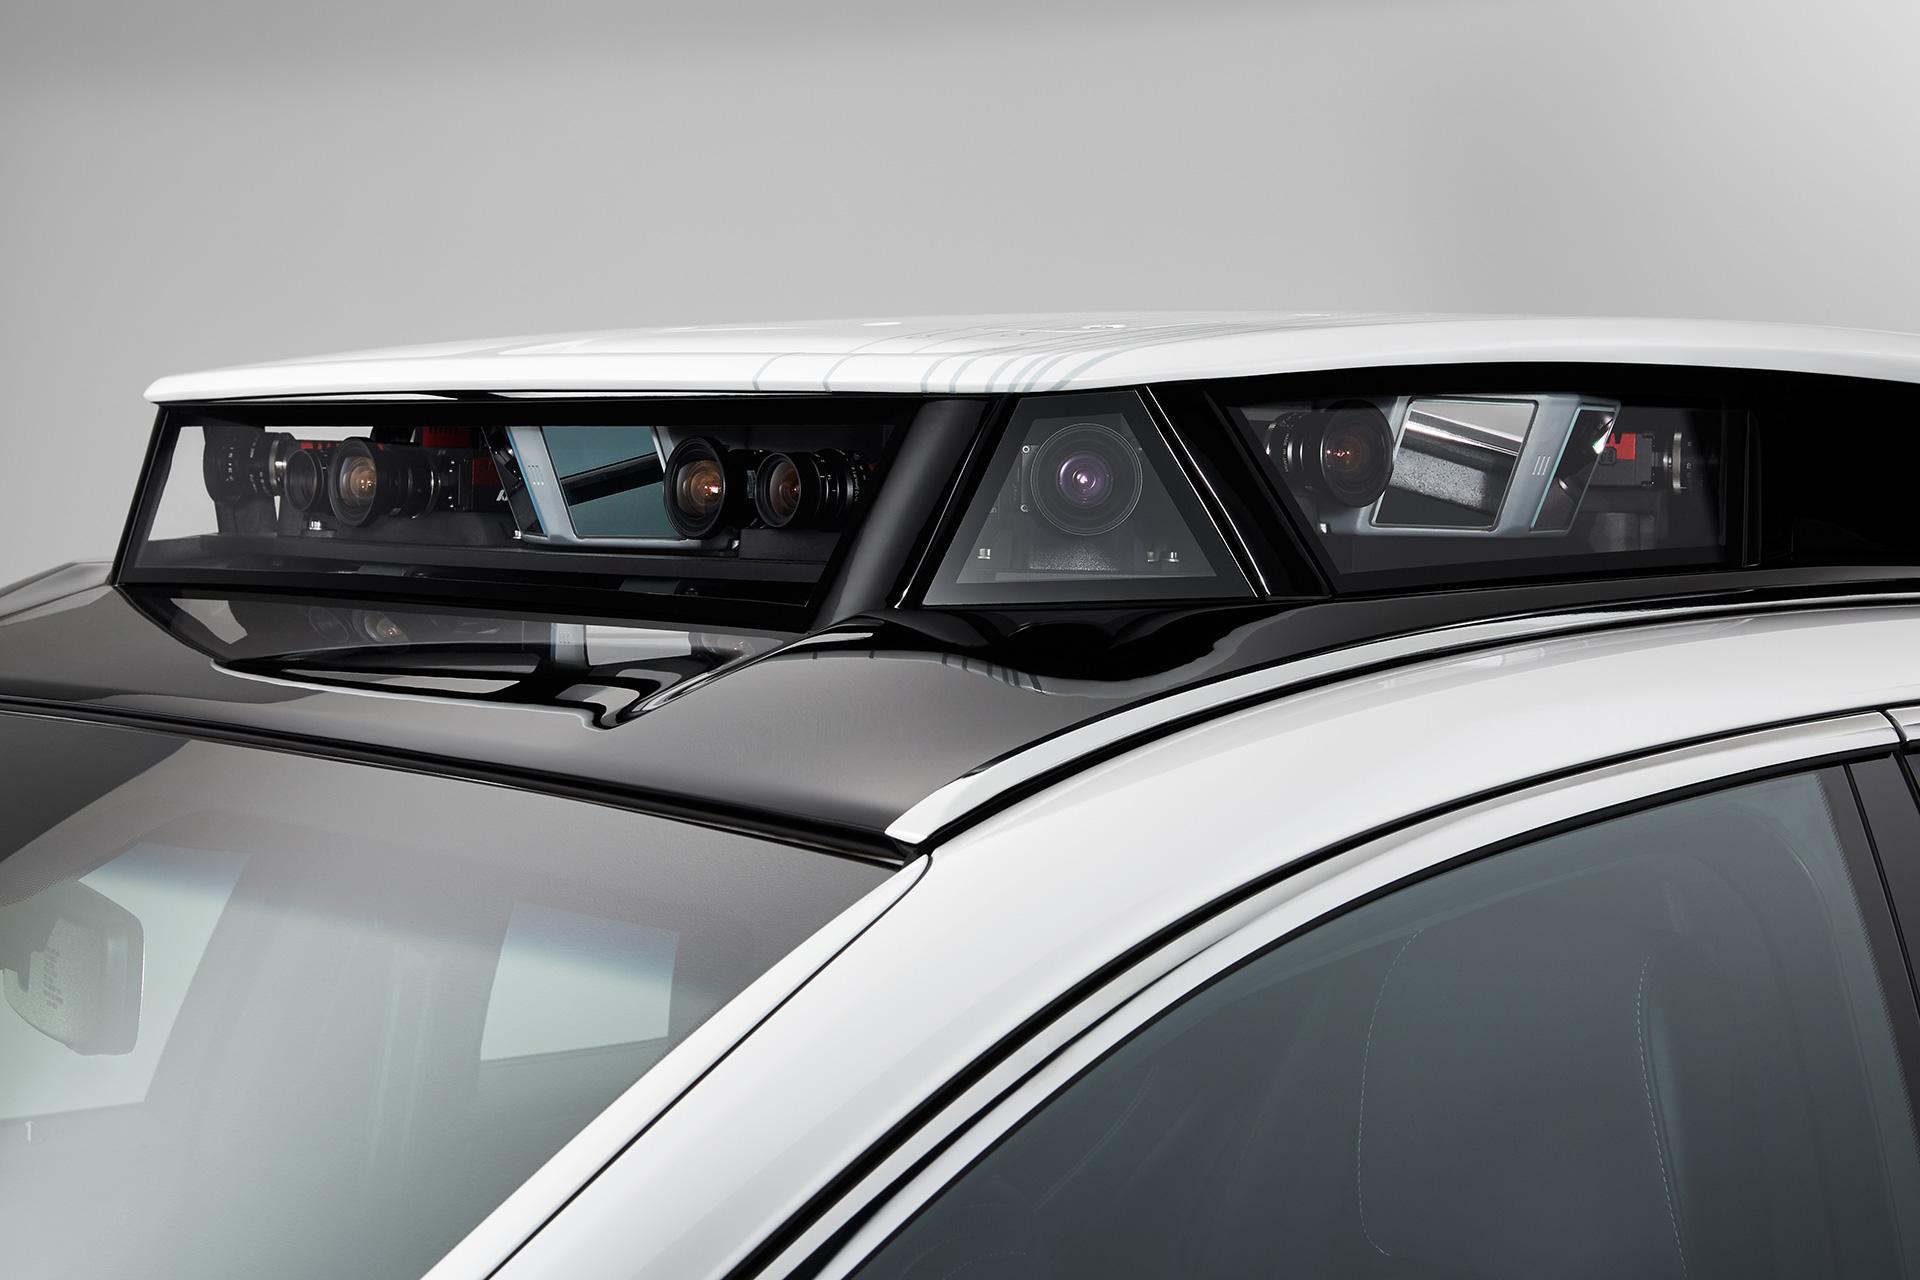 「【CES 2019】新型レクサスLSをベースとした自動運転実験車「TRI-P4」を披露」の6枚目の画像